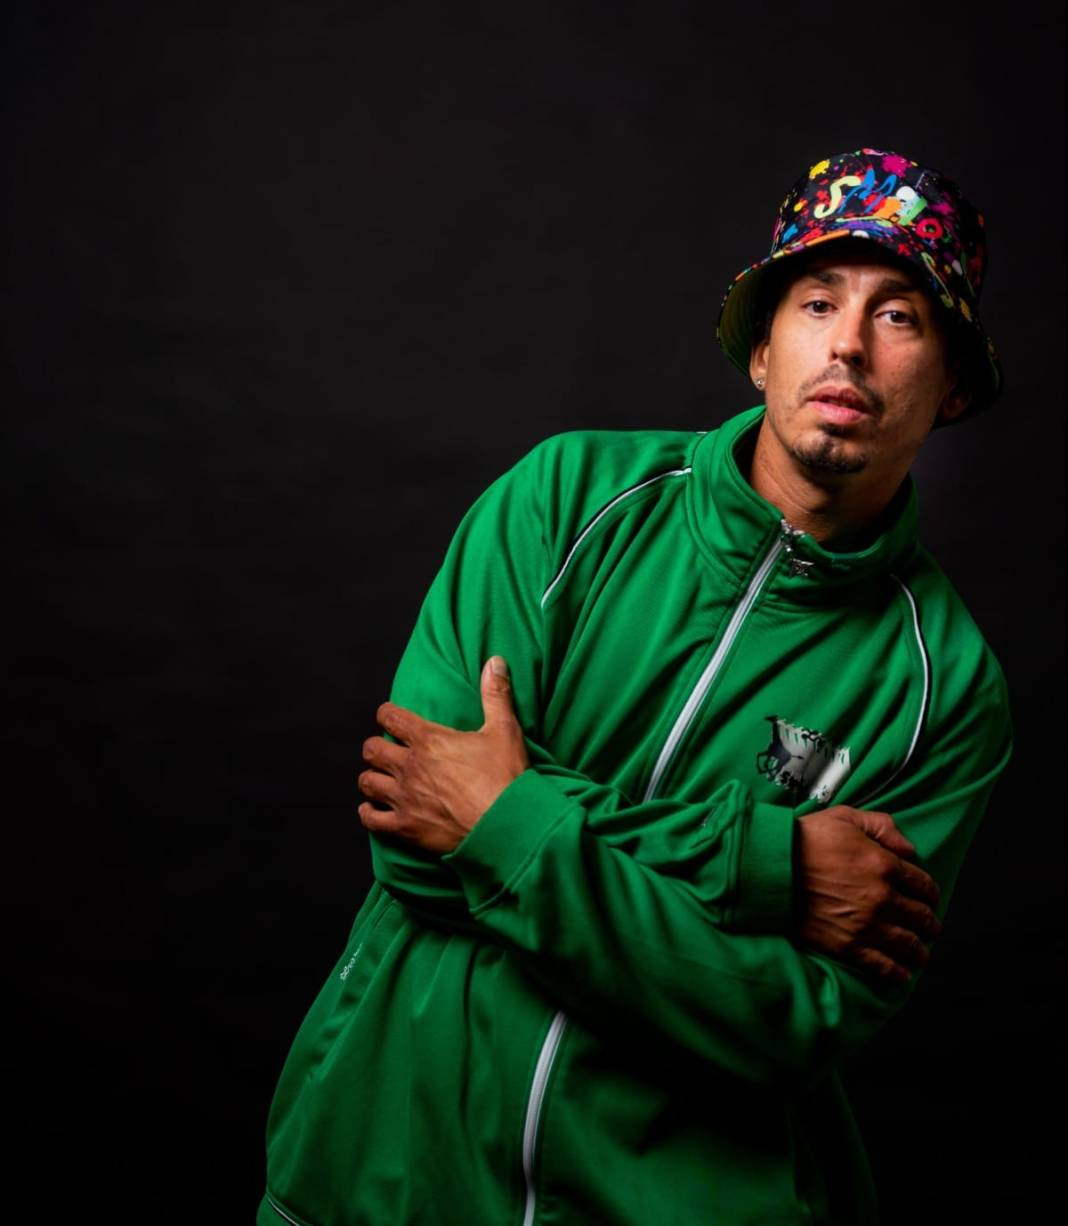 Niño Brown - Melodic Hip hop